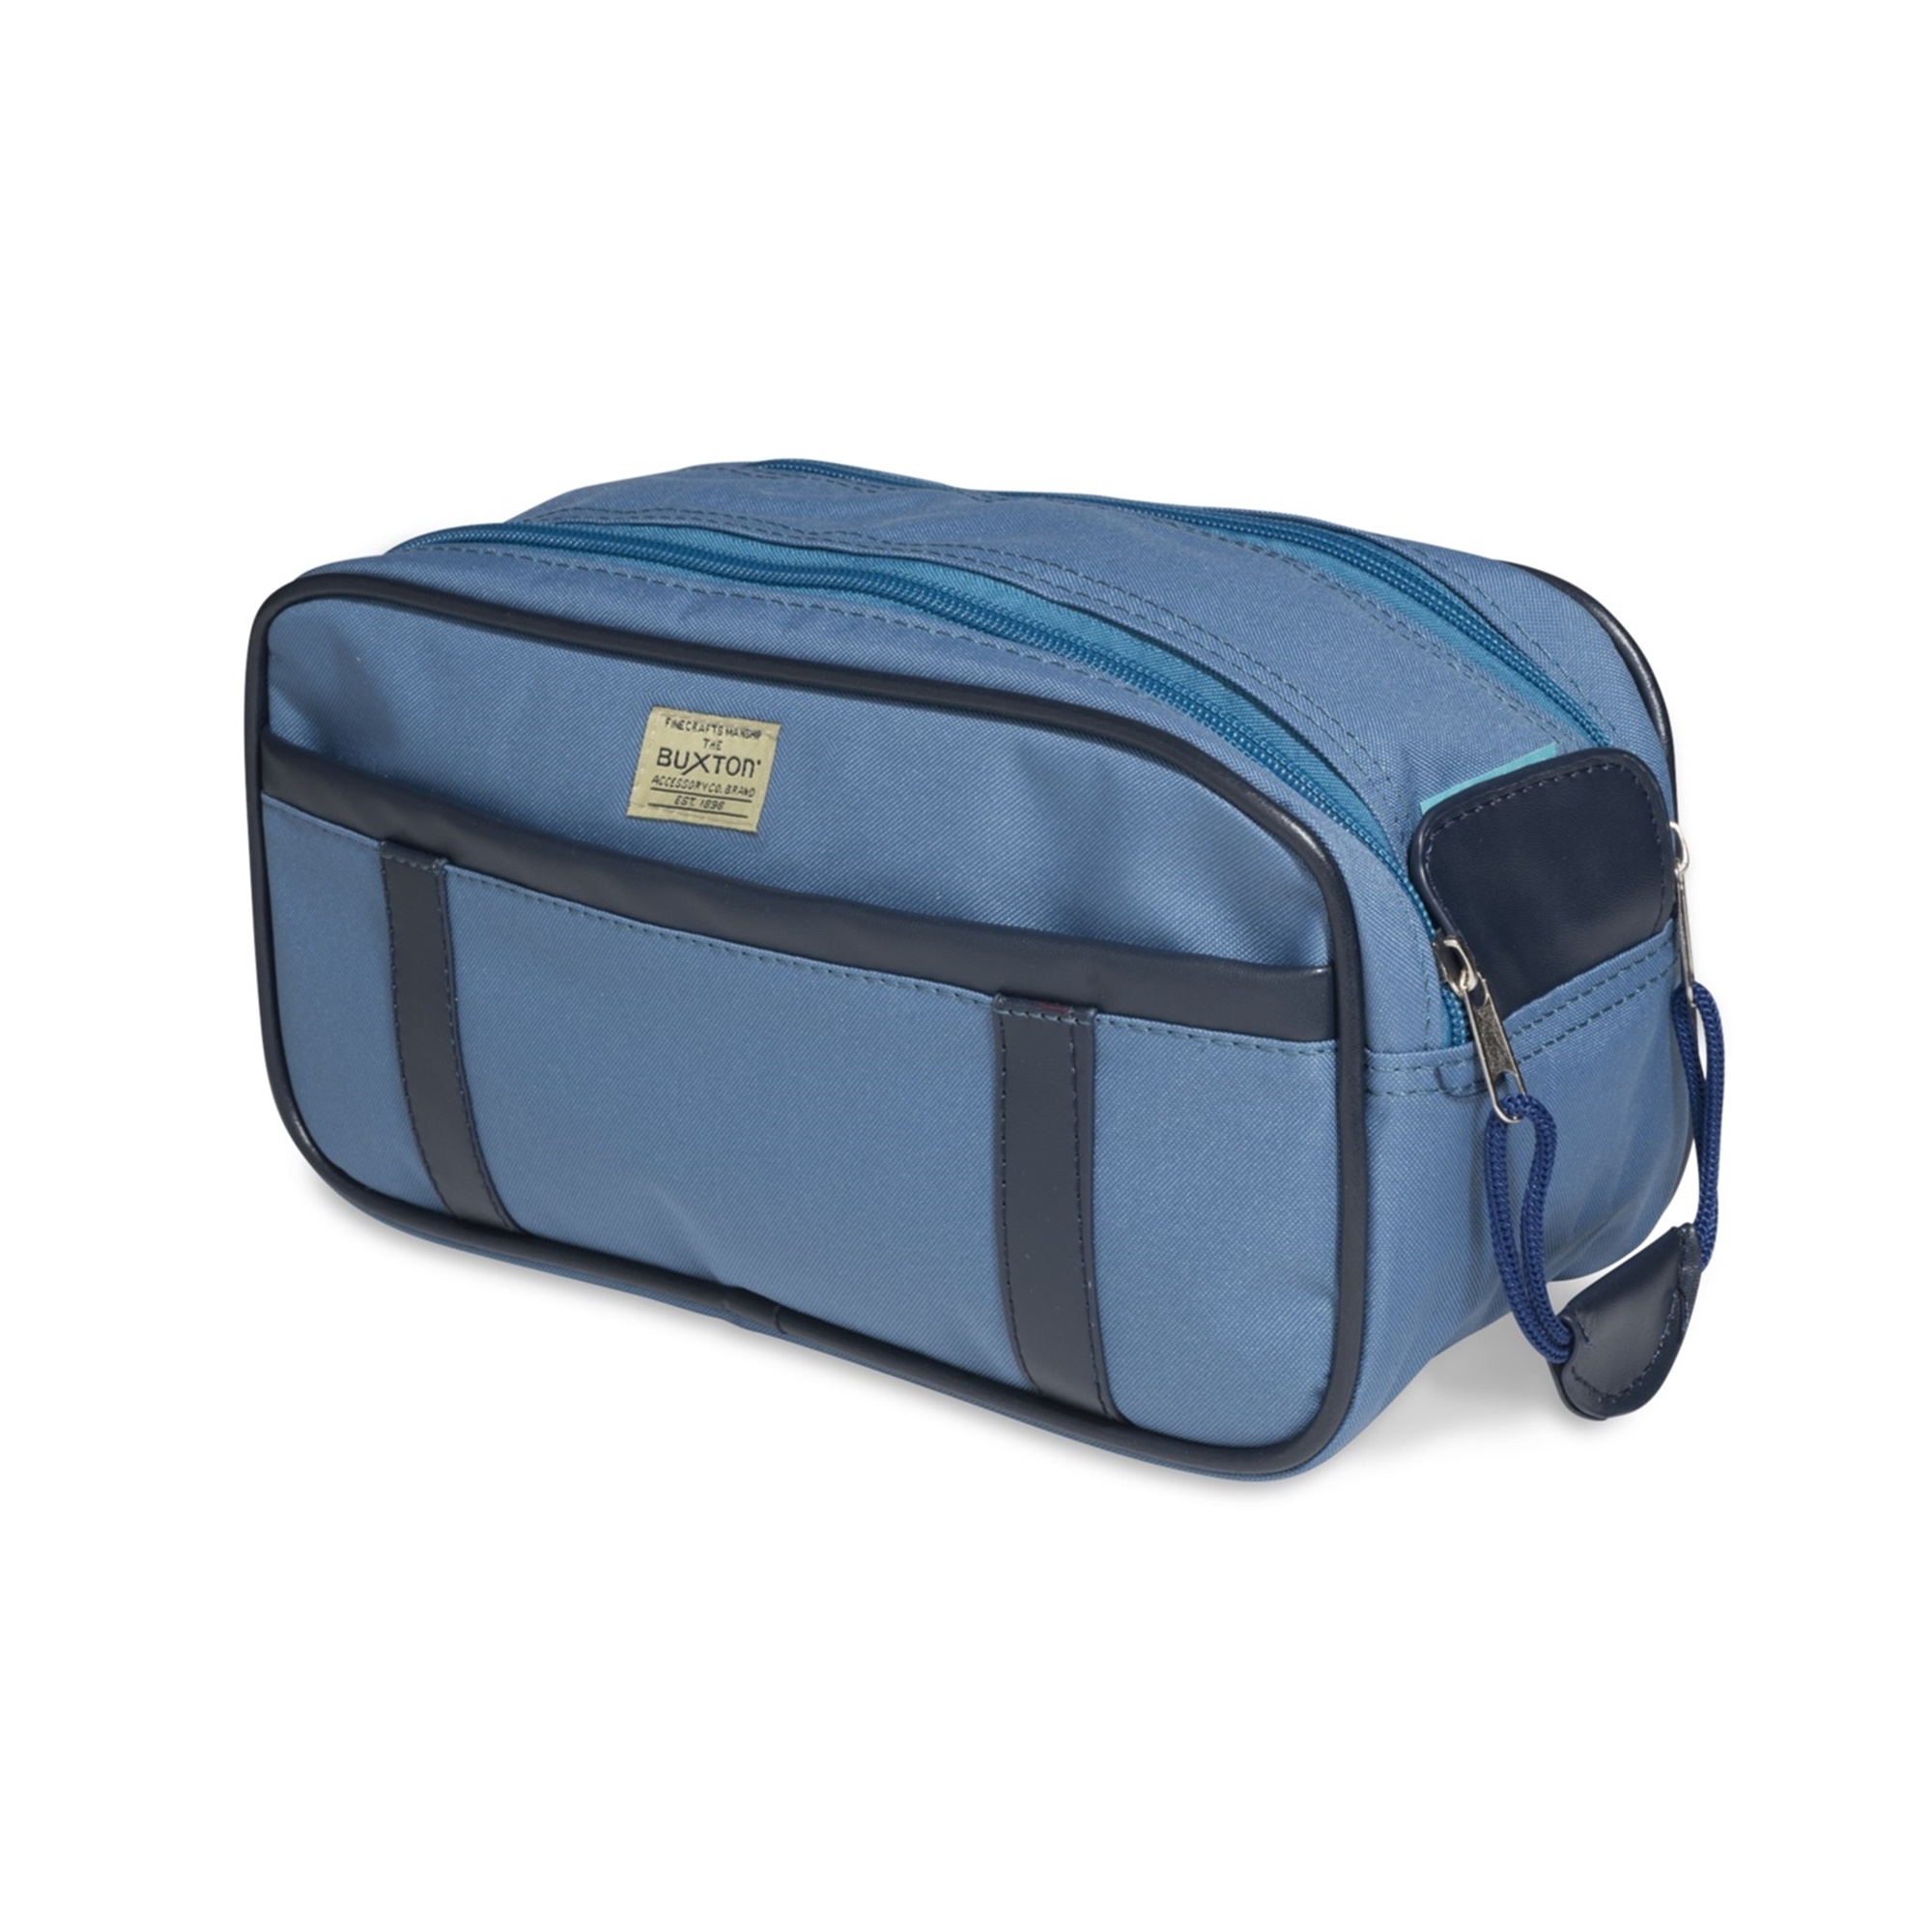 Buxton Orleans Unisex Multi-Zip Fanny Lumbar Pack